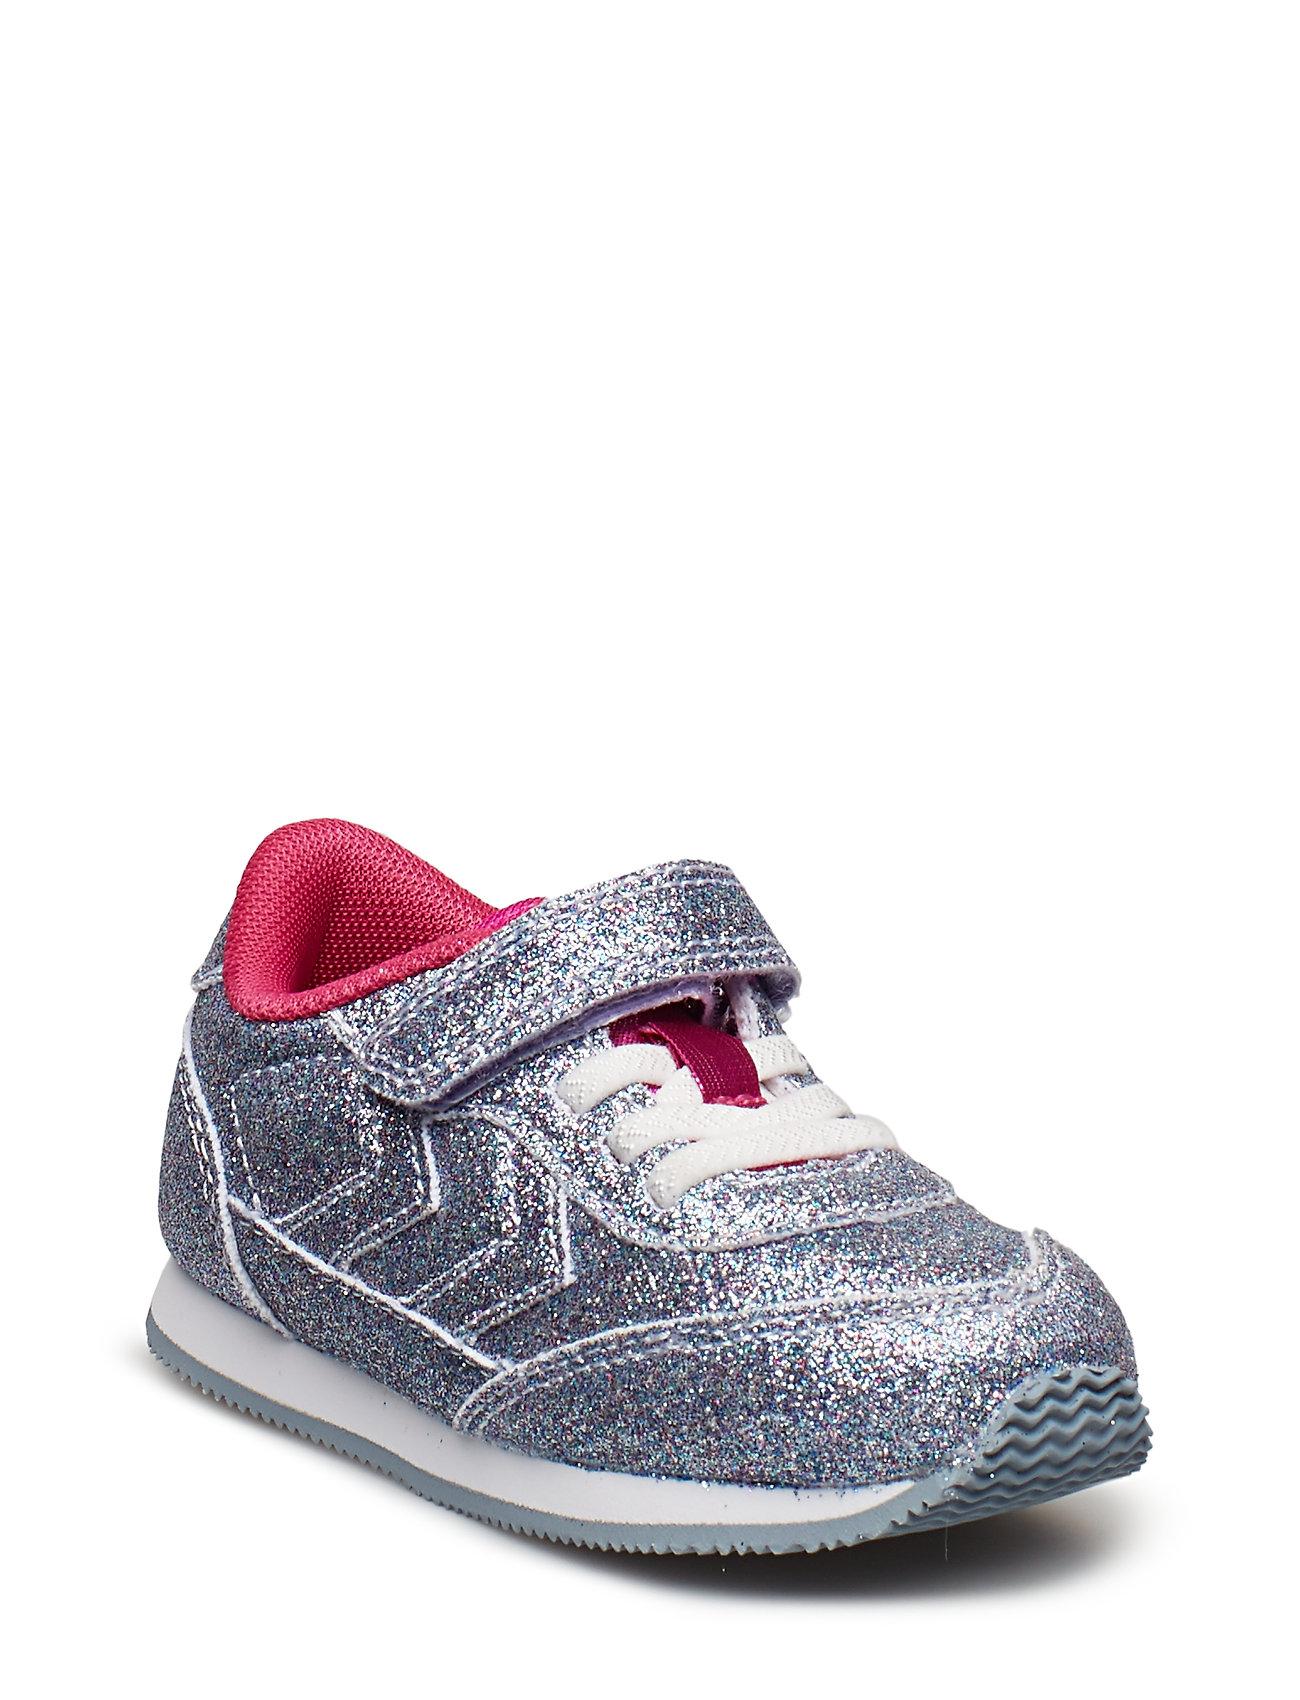 5ce3ab3a Reflex Glitter Infant (Multi Col.) (227.50 kr) - Hummel - | Boozt.com